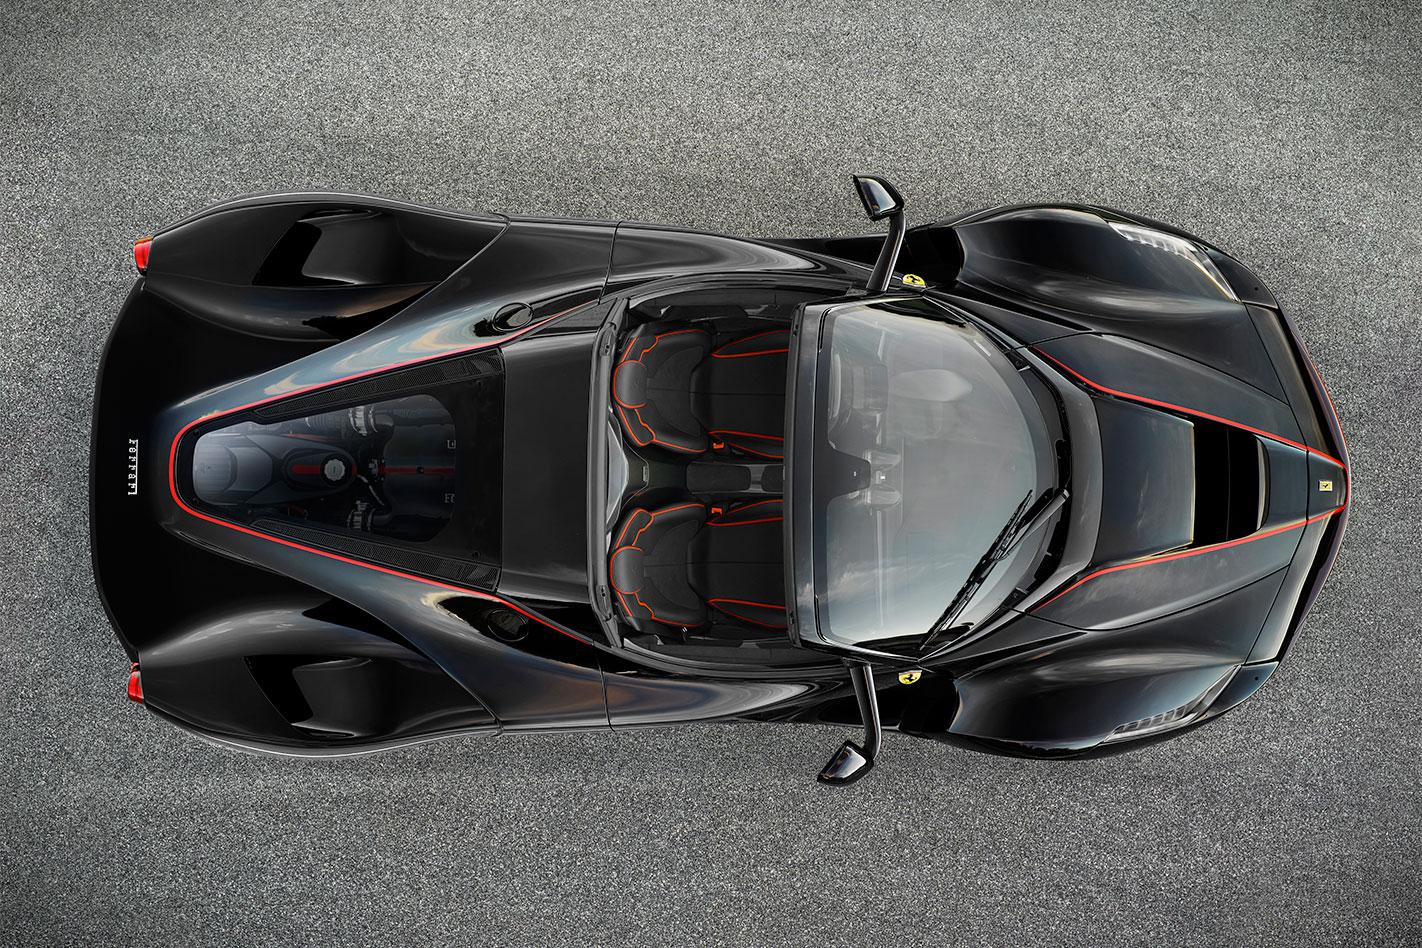 La Ferrari Aperta above